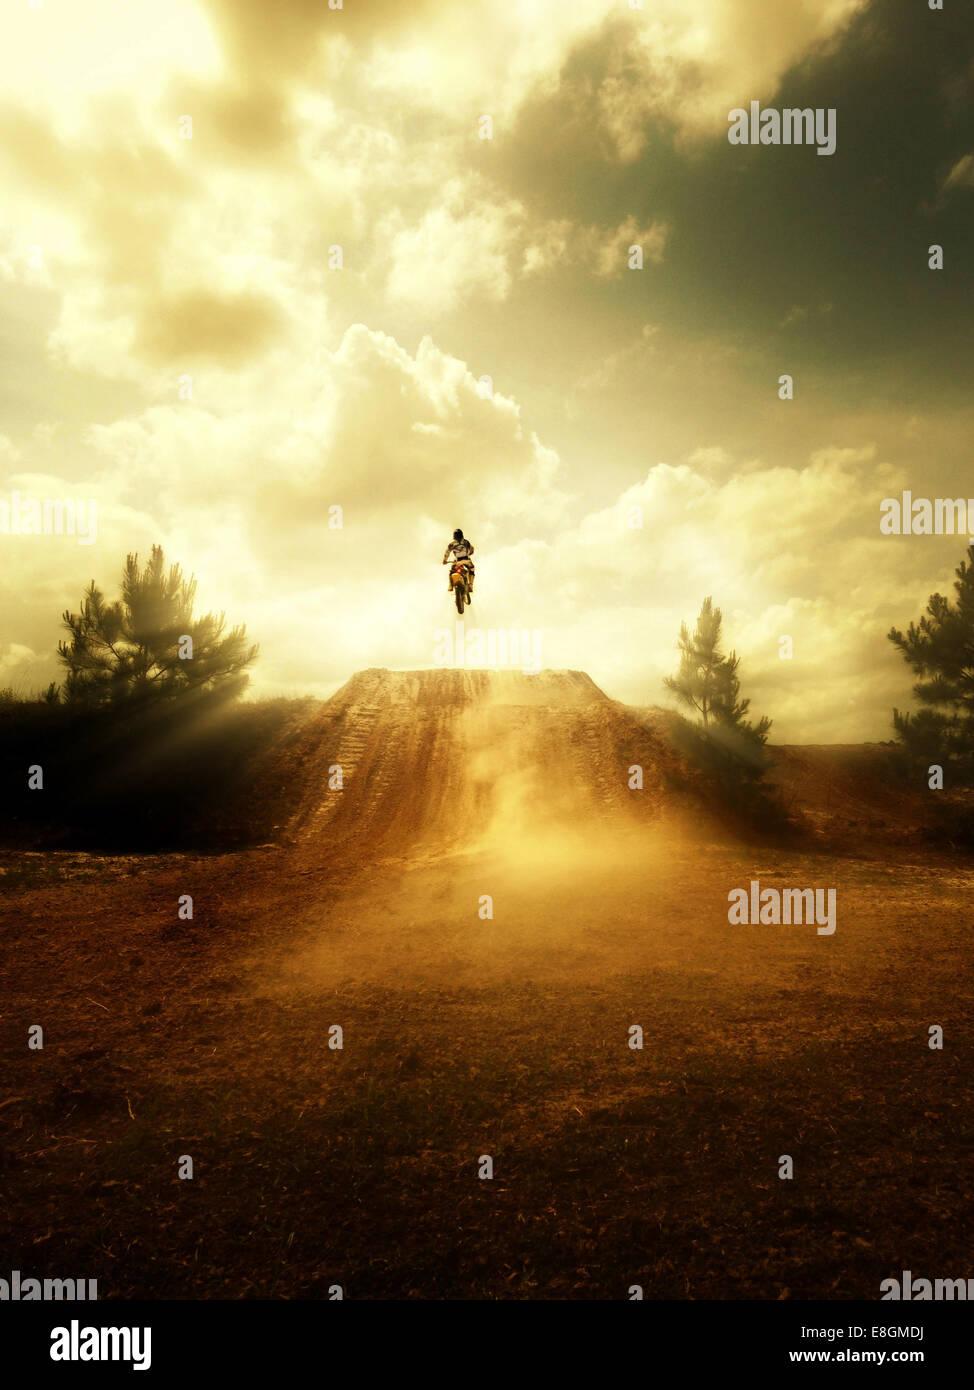 USA, Florida, Clay County, Green Cove Springs Person springen auf Motorrad Stockbild